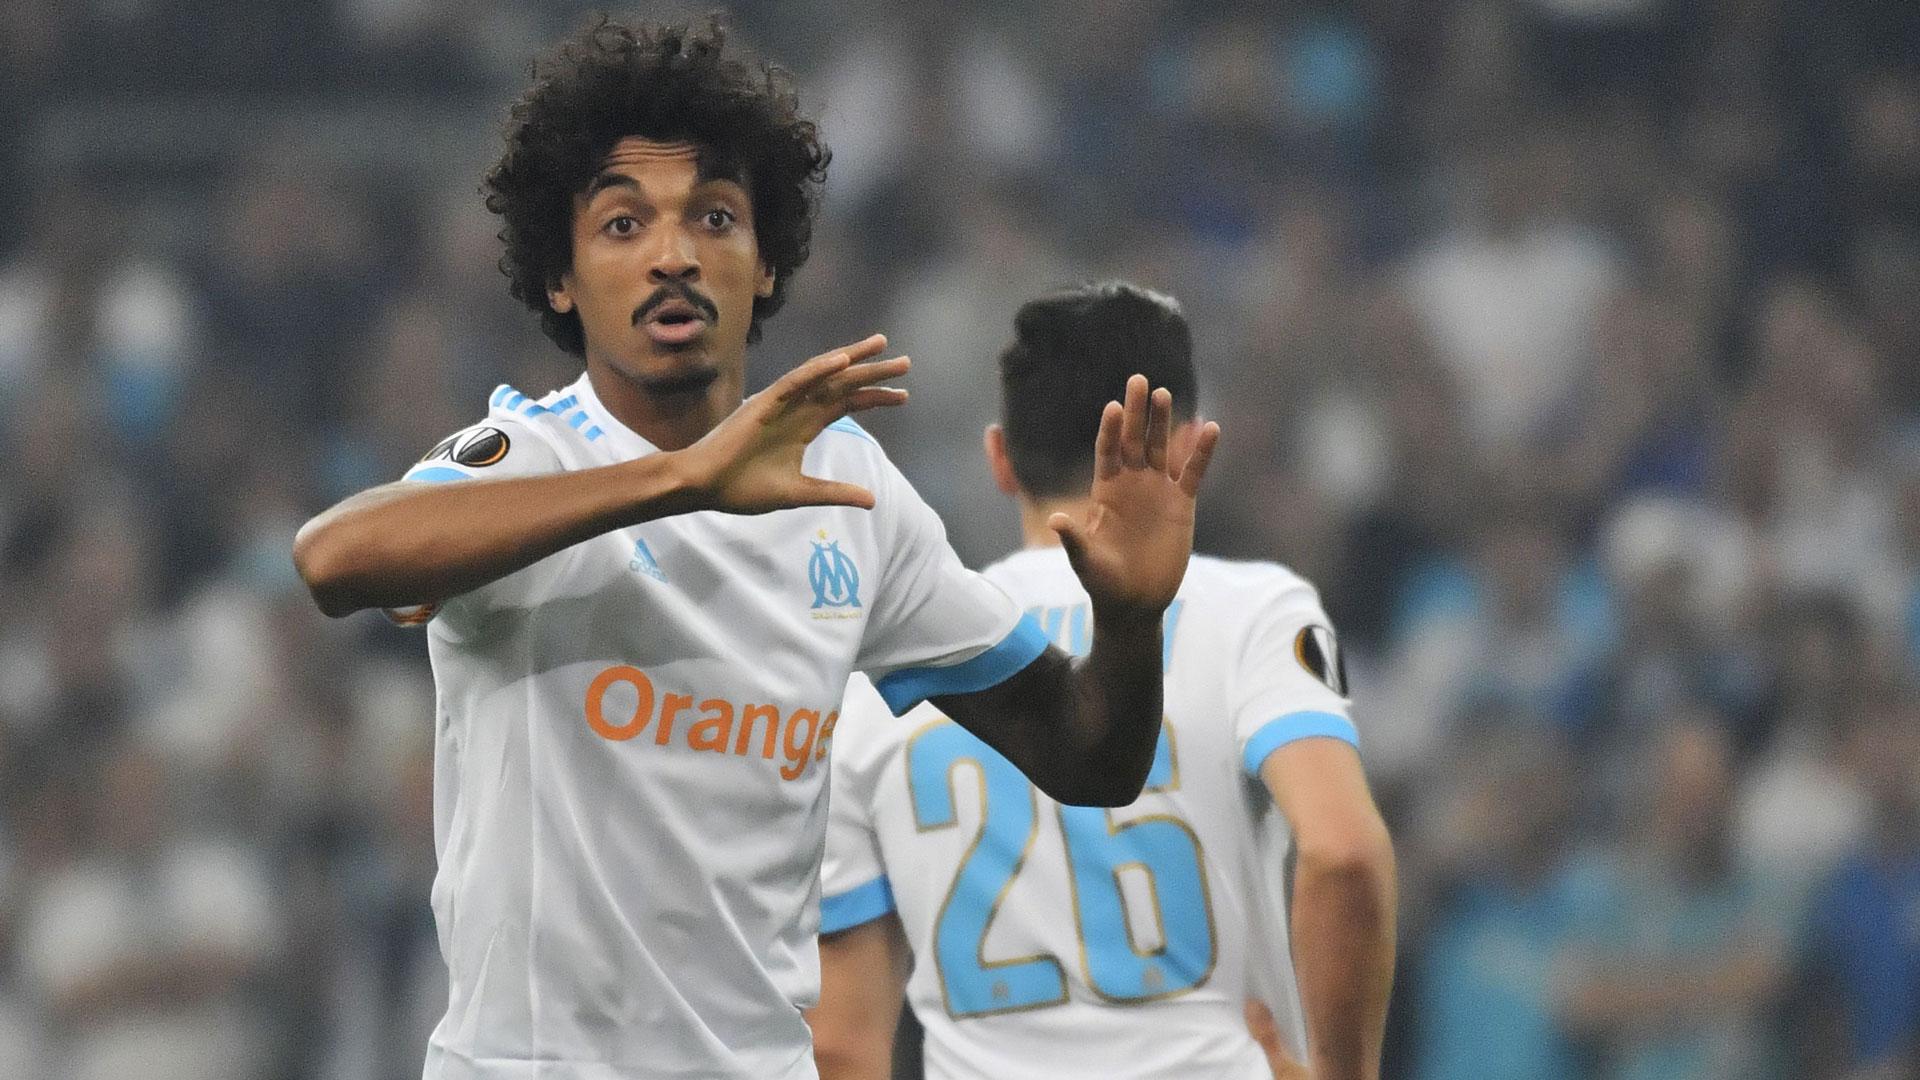 L'OL intéressé par Luiz Gustavo (Marseille) ?